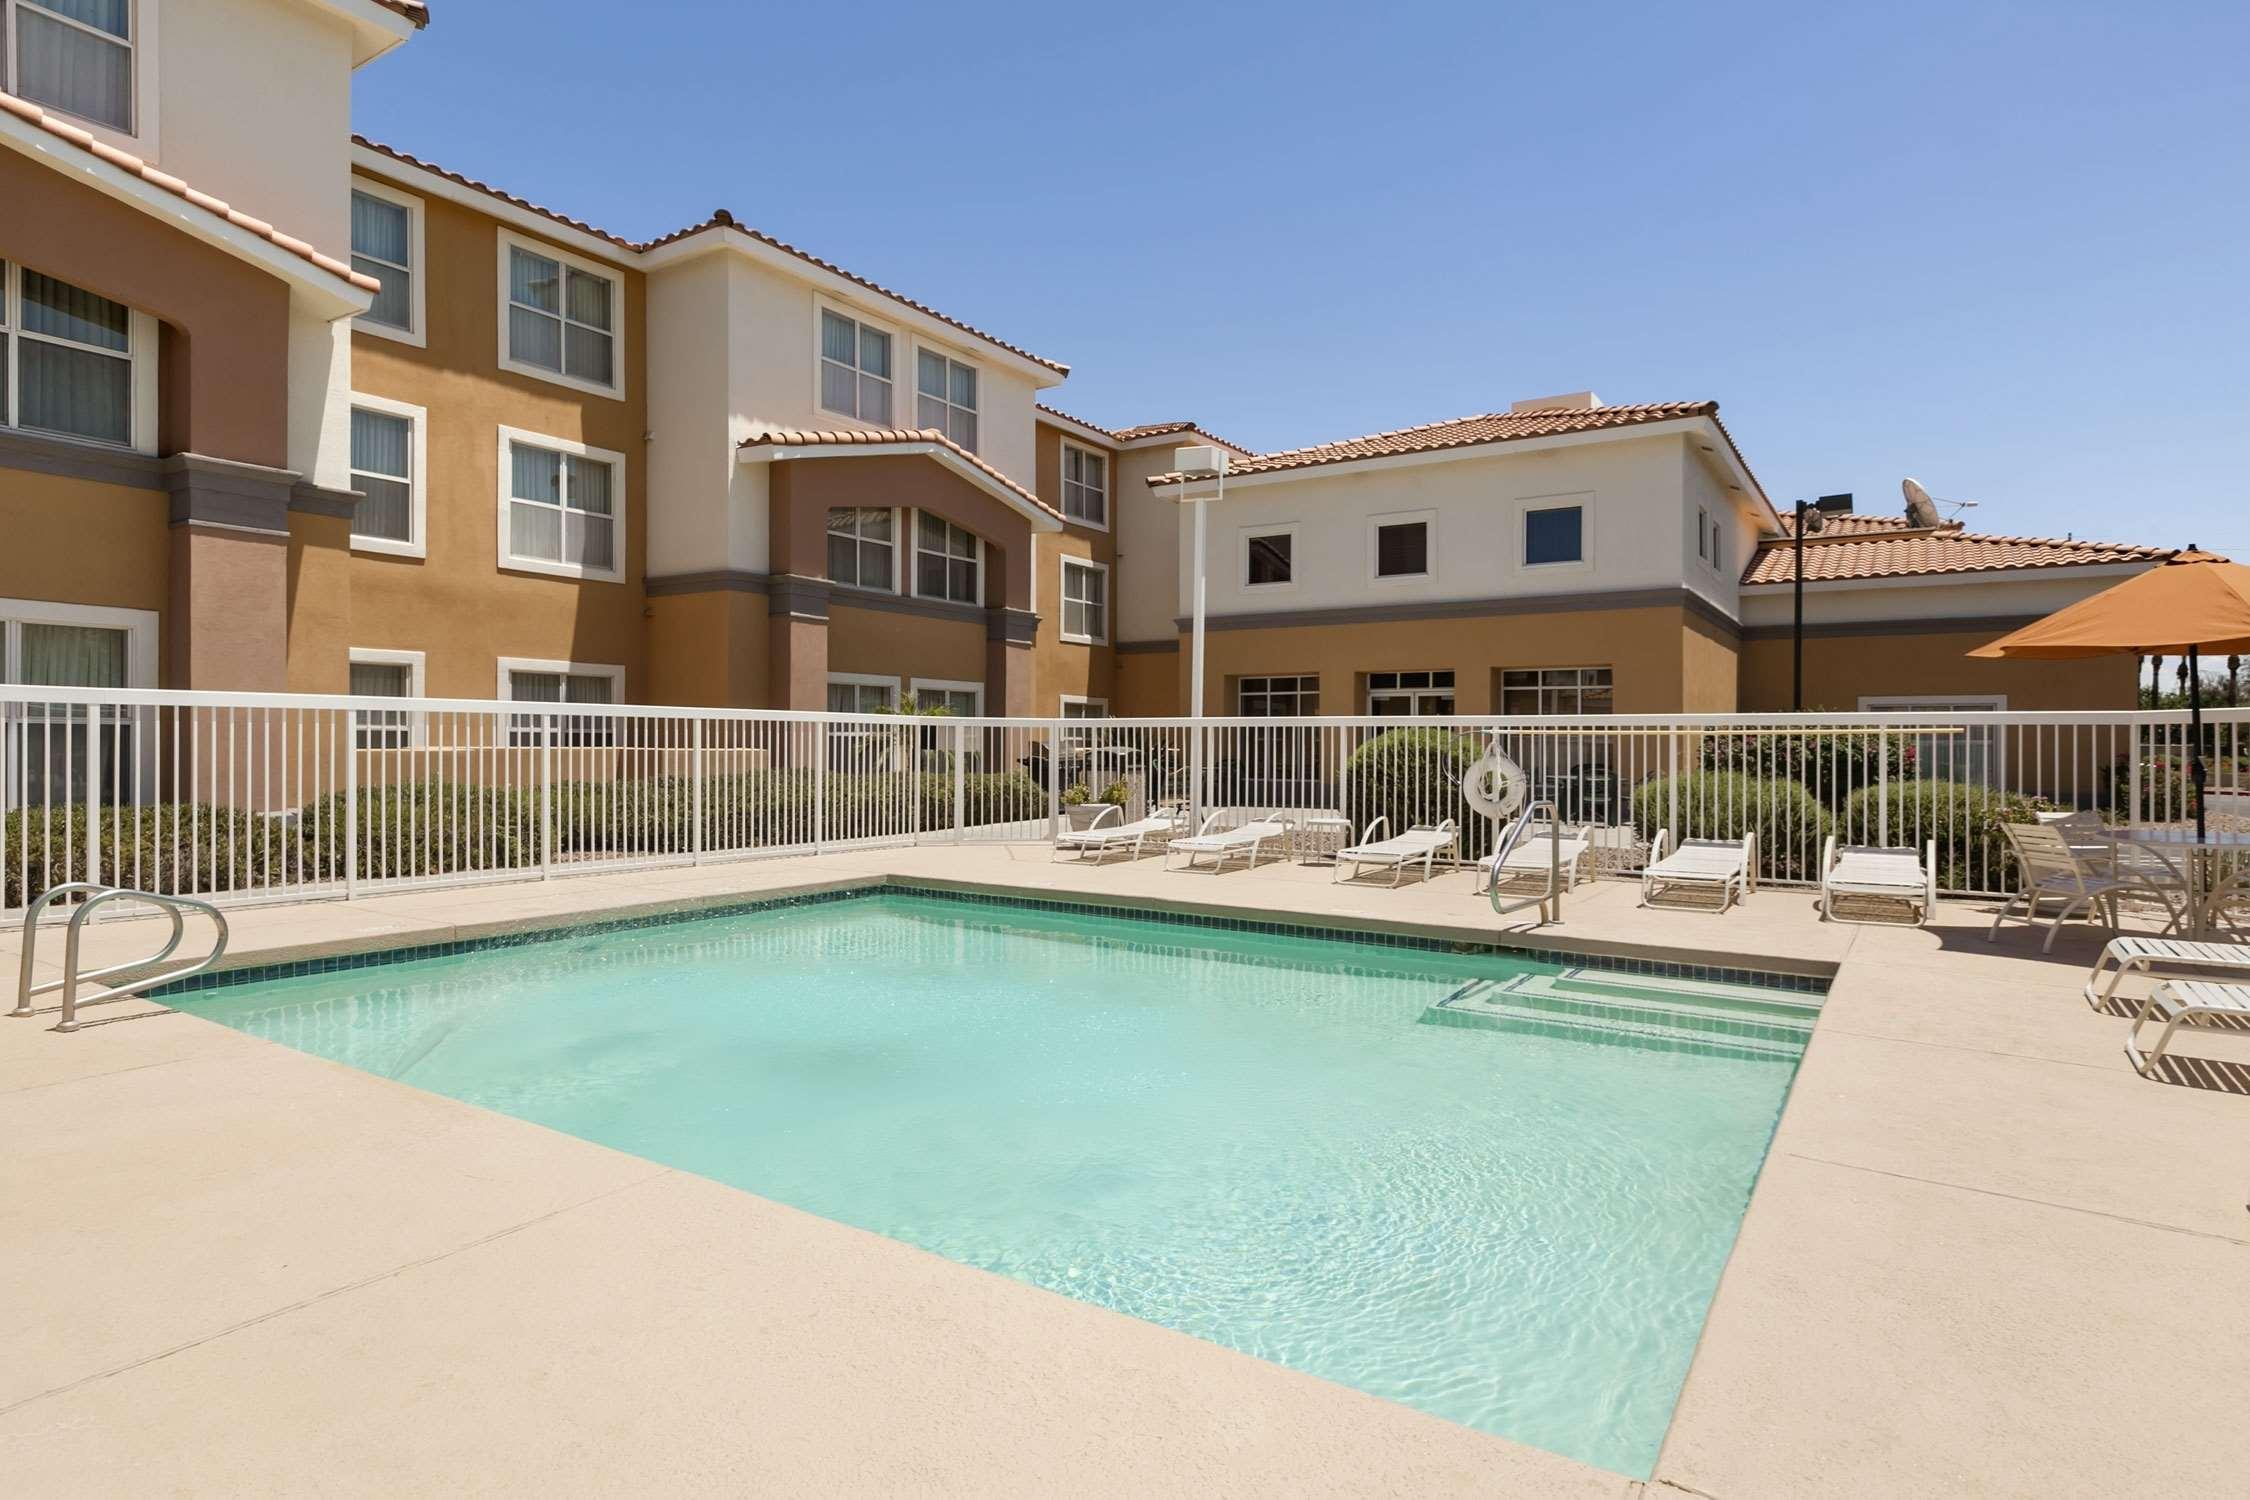 Homewood Suites by Hilton Phoenix/Scottsdale image 2